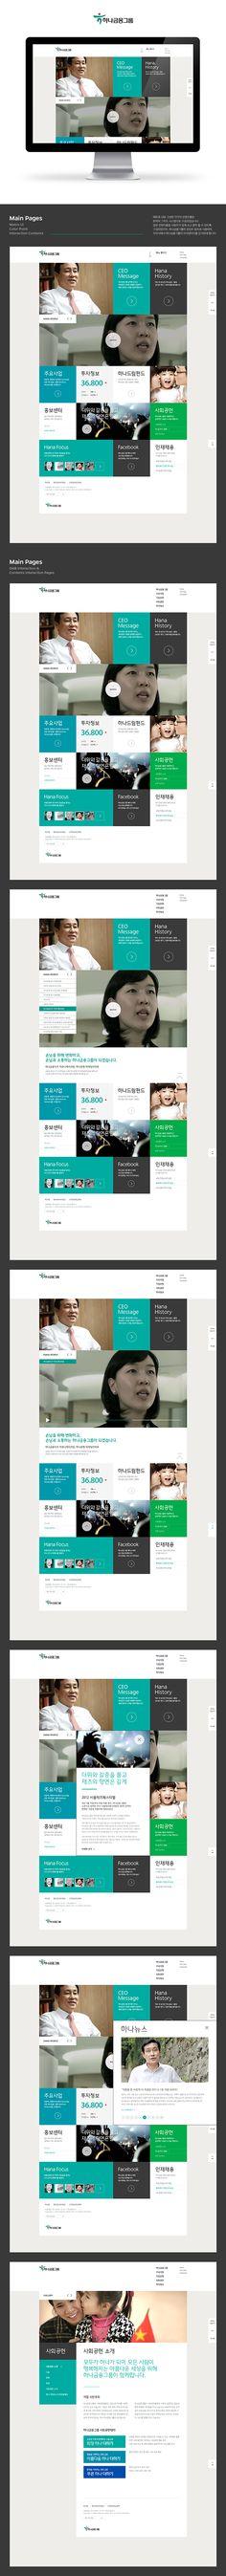 Hana Financial Group WebSite Concept Design by youngha choi, via Behance